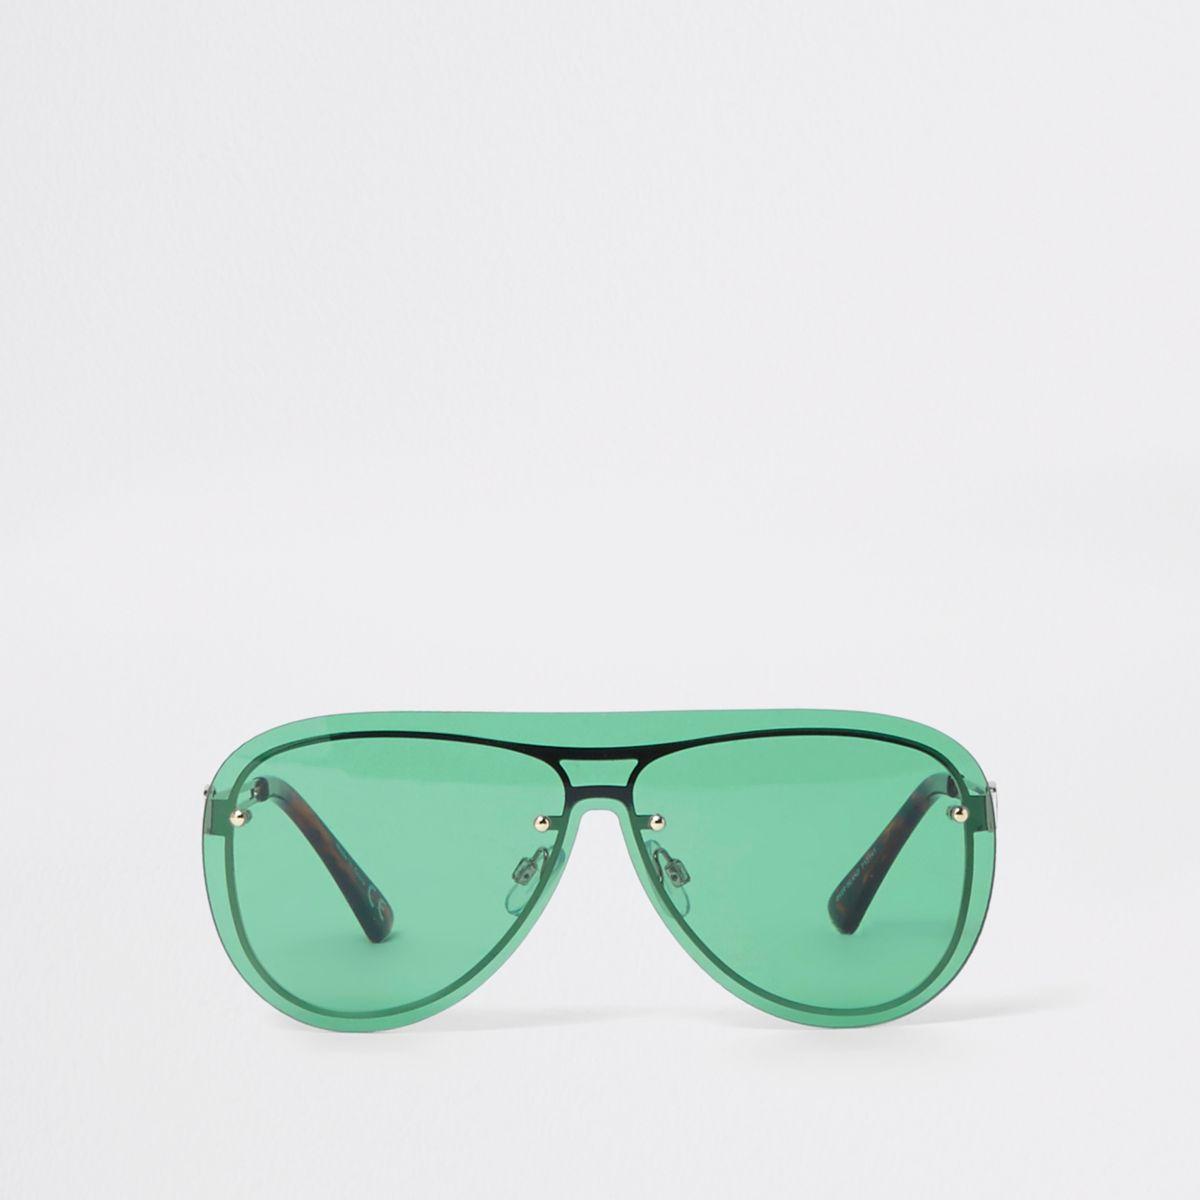 Green visor aviator sunglasses